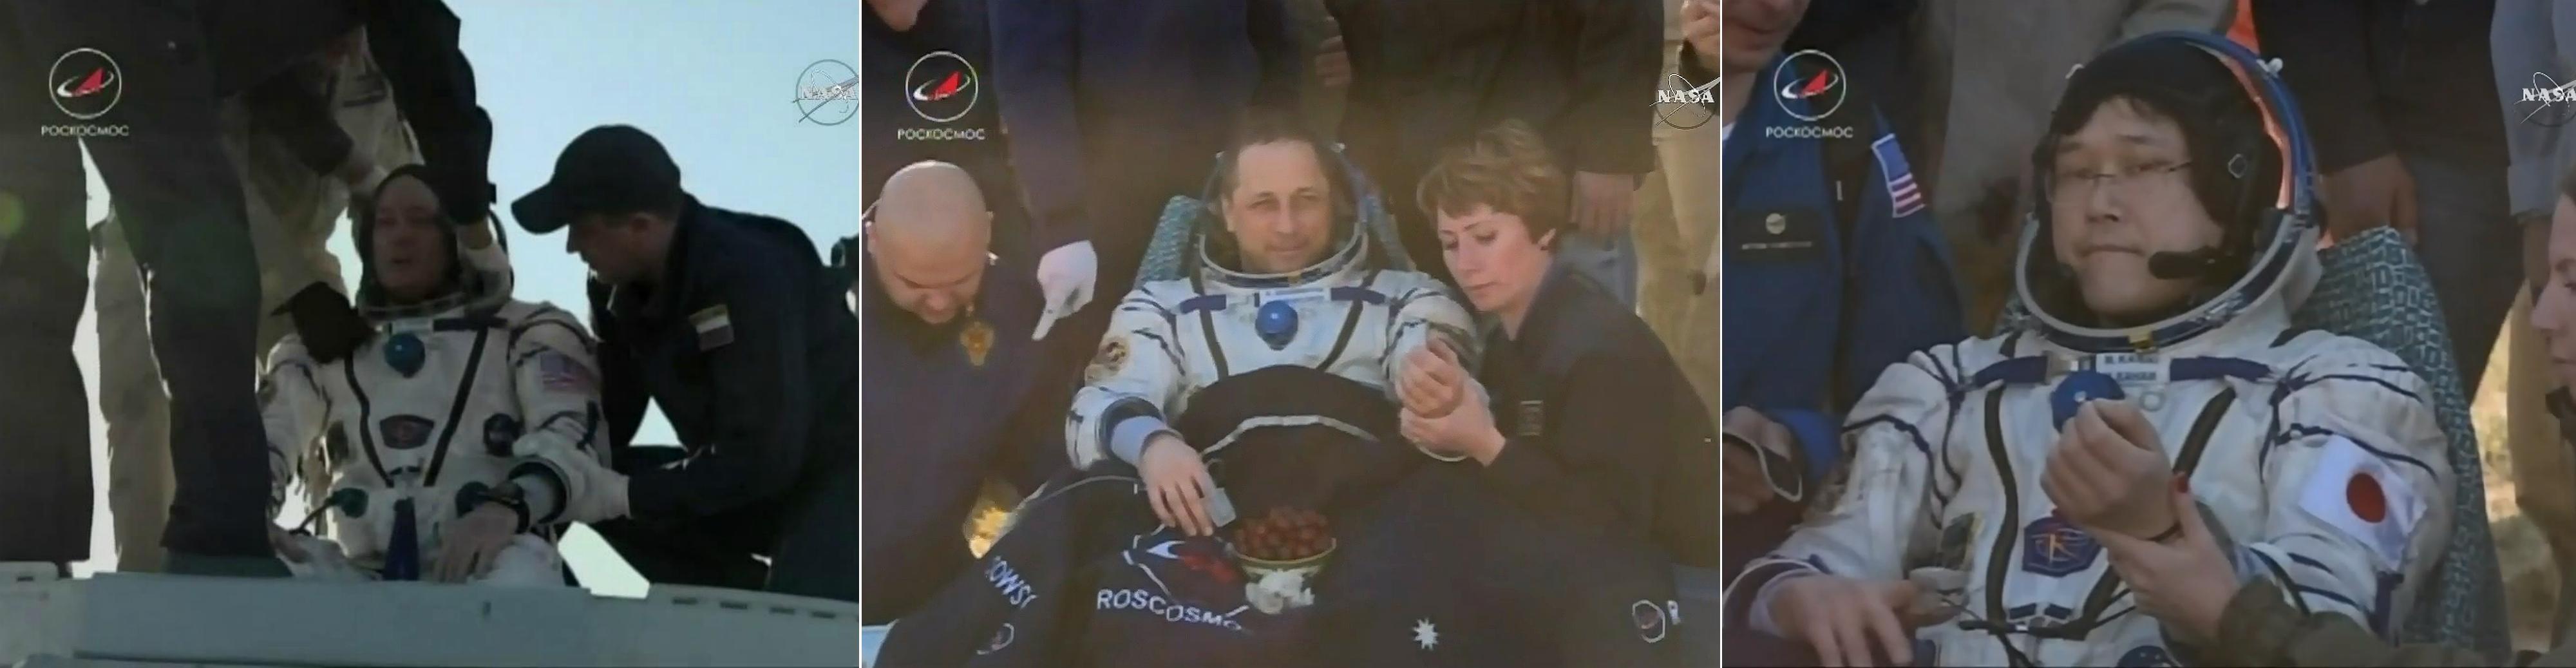 NASA宇航员,机组人员从空间站安全返回地球